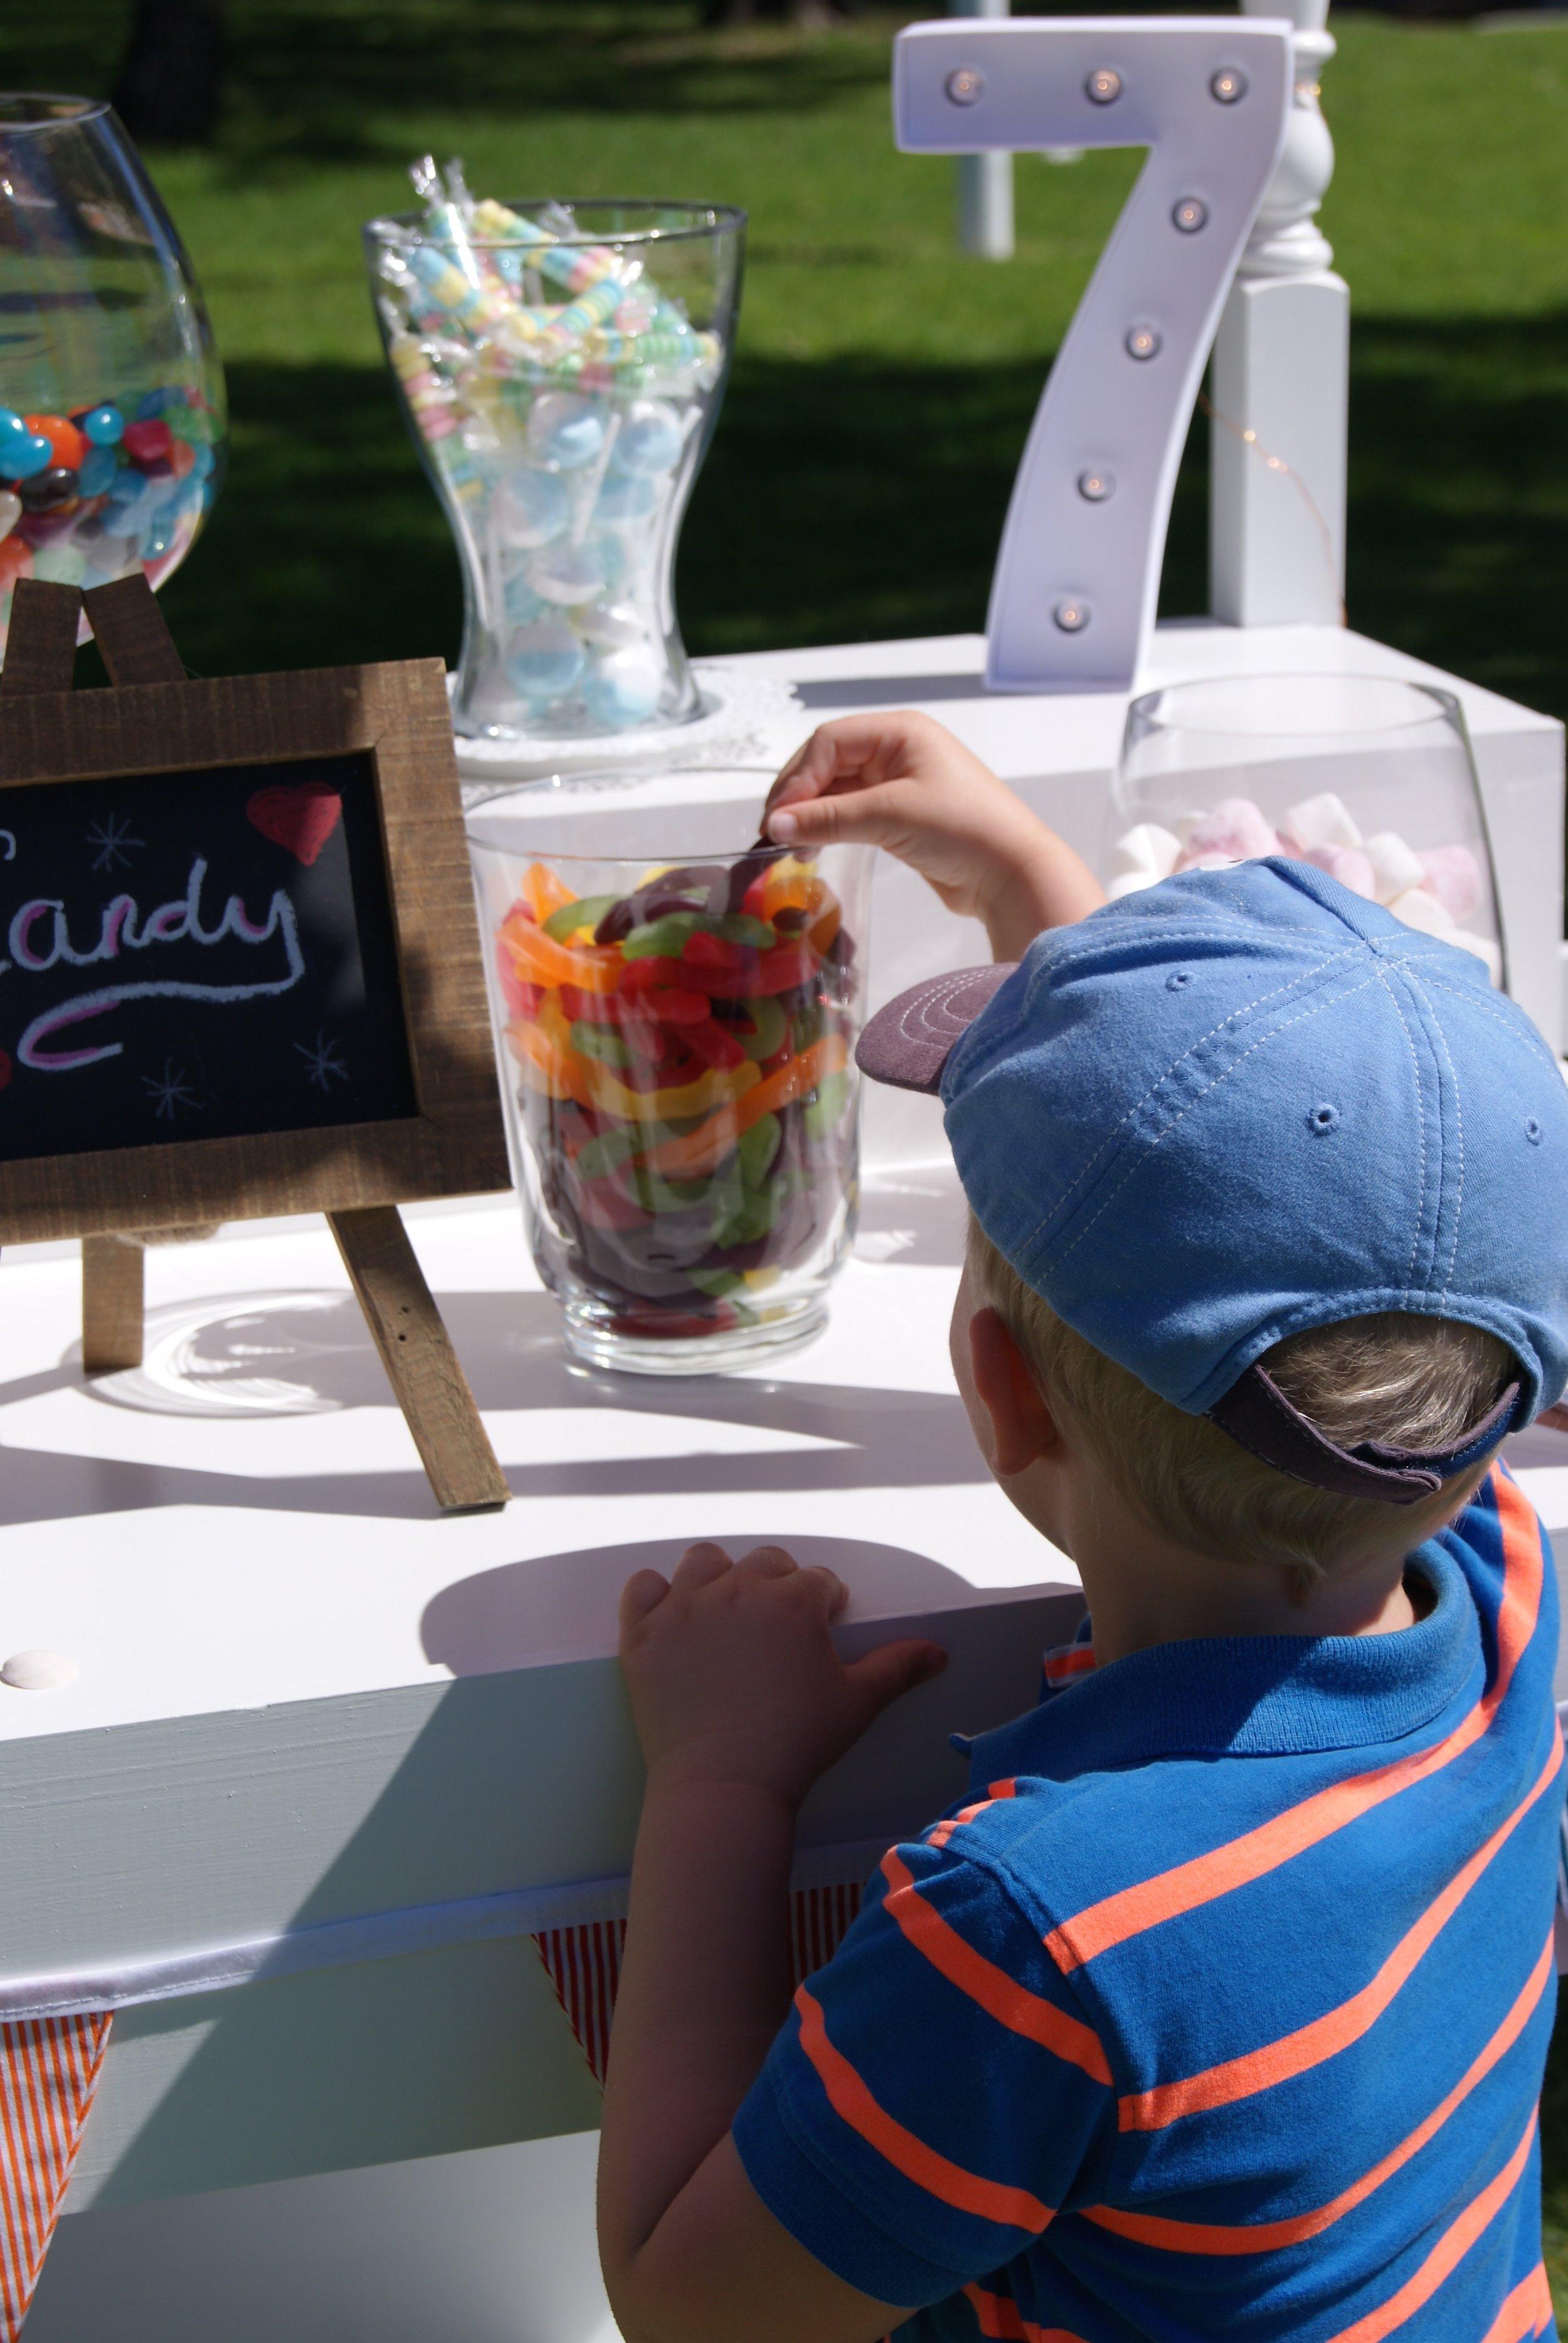 Boy_Taking_Lolly_Snake_Little Lolly Cart.jpg